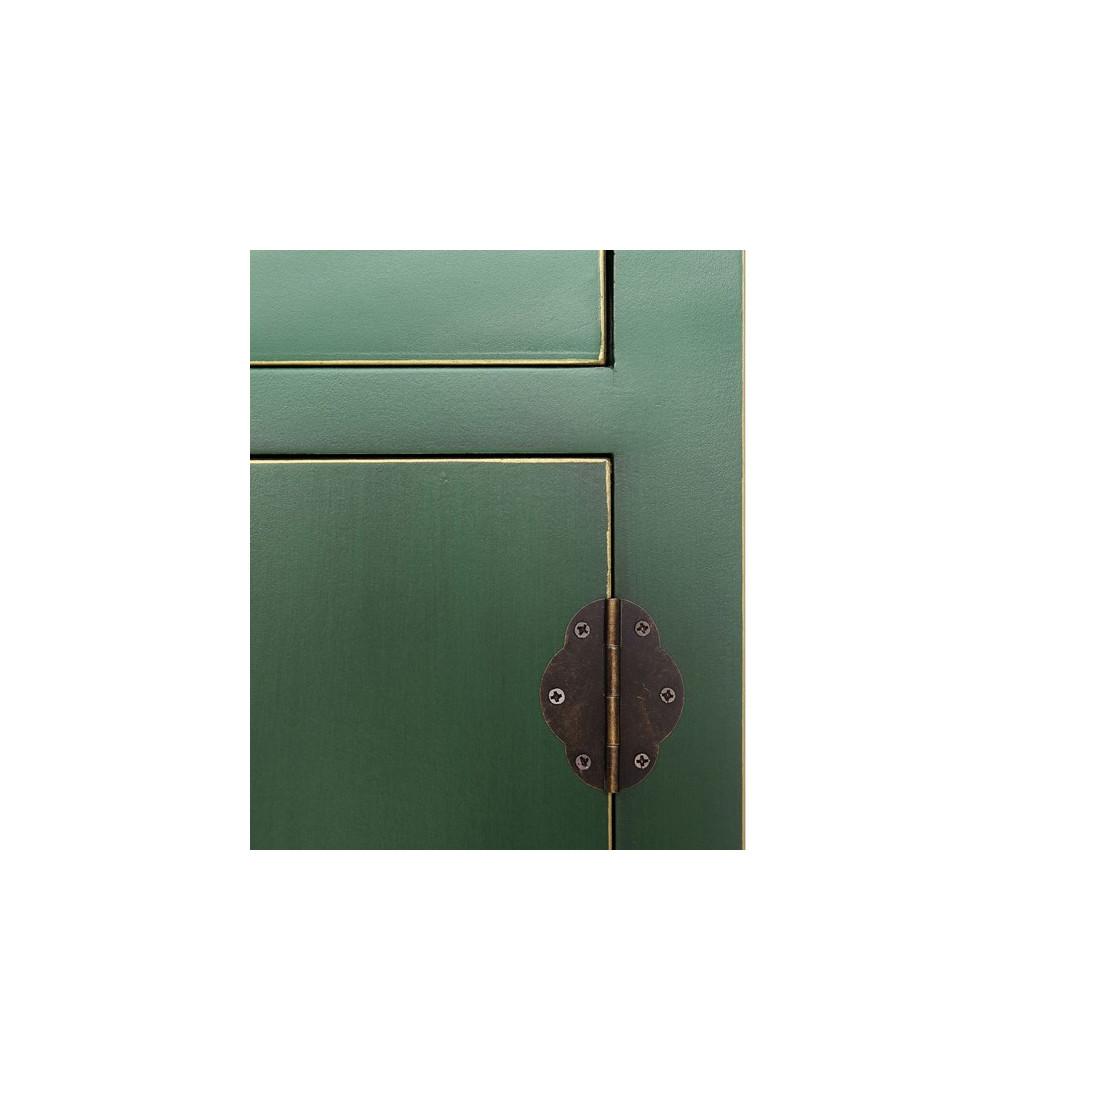 Armoire Chambre Verte : Armoire verte meuble chinois pekin univers de la chambre